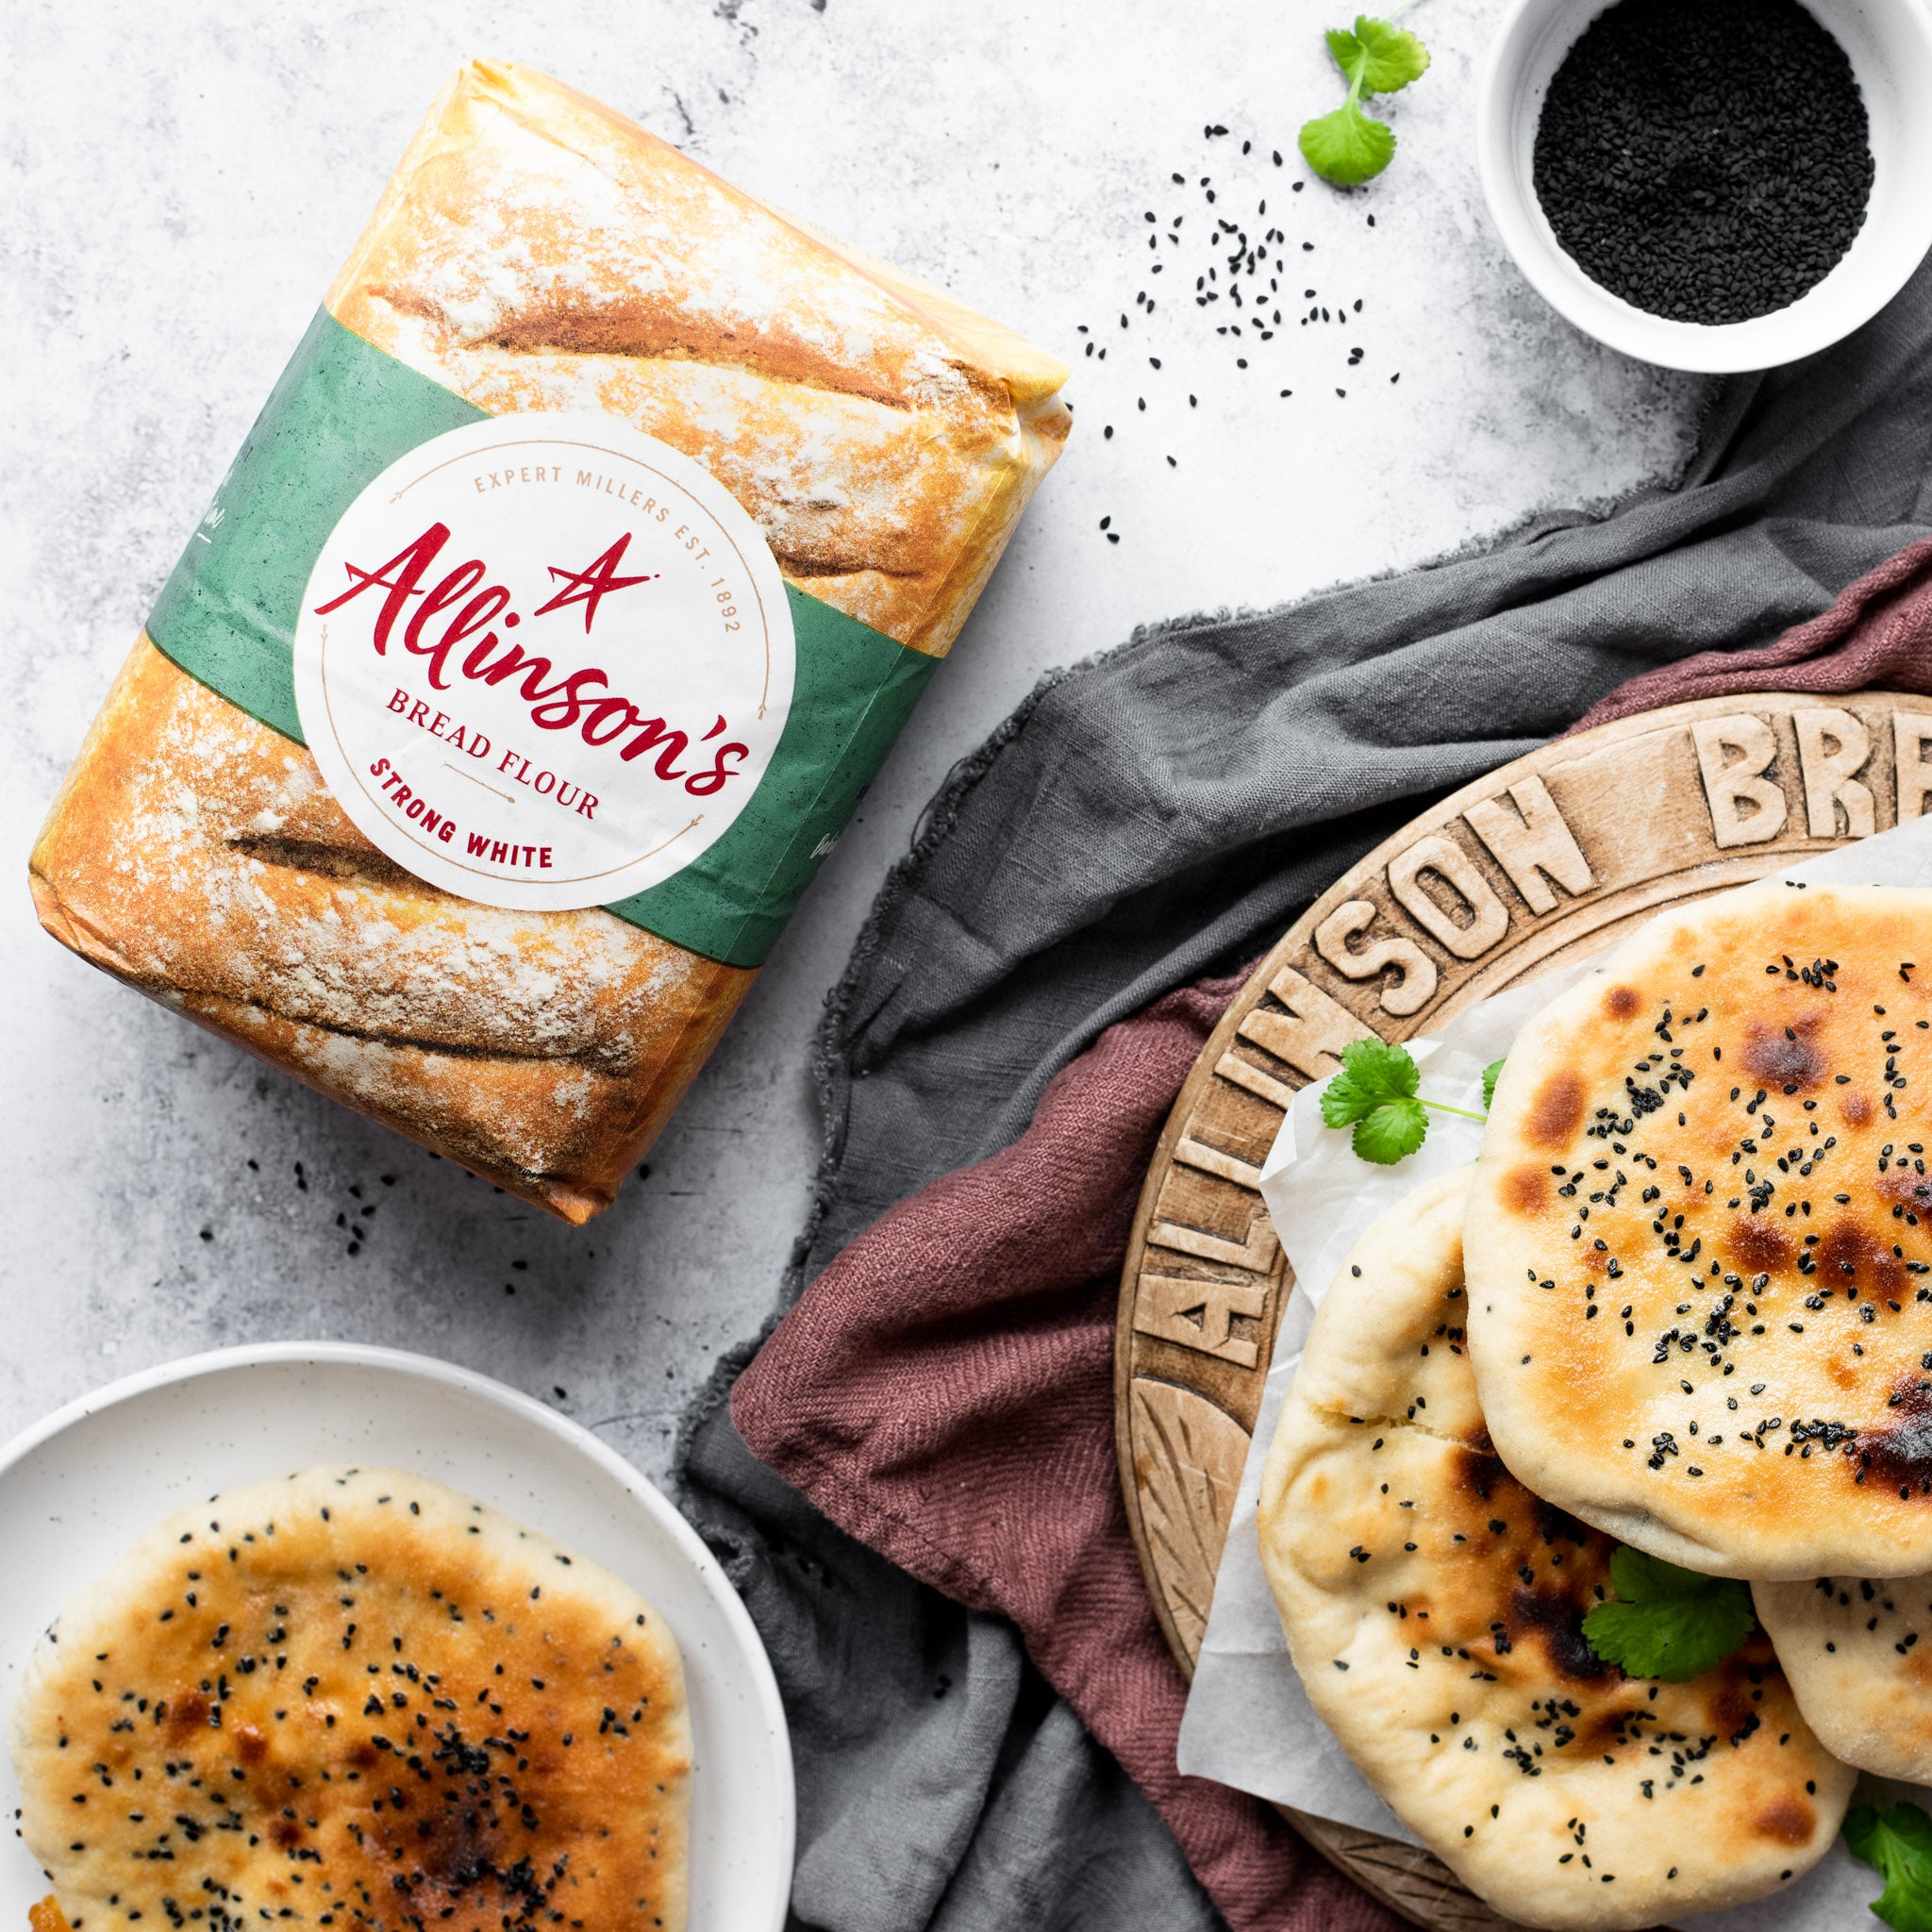 Allinsons-Naan-Bread-1-1-Baking-Mad-9.jpg